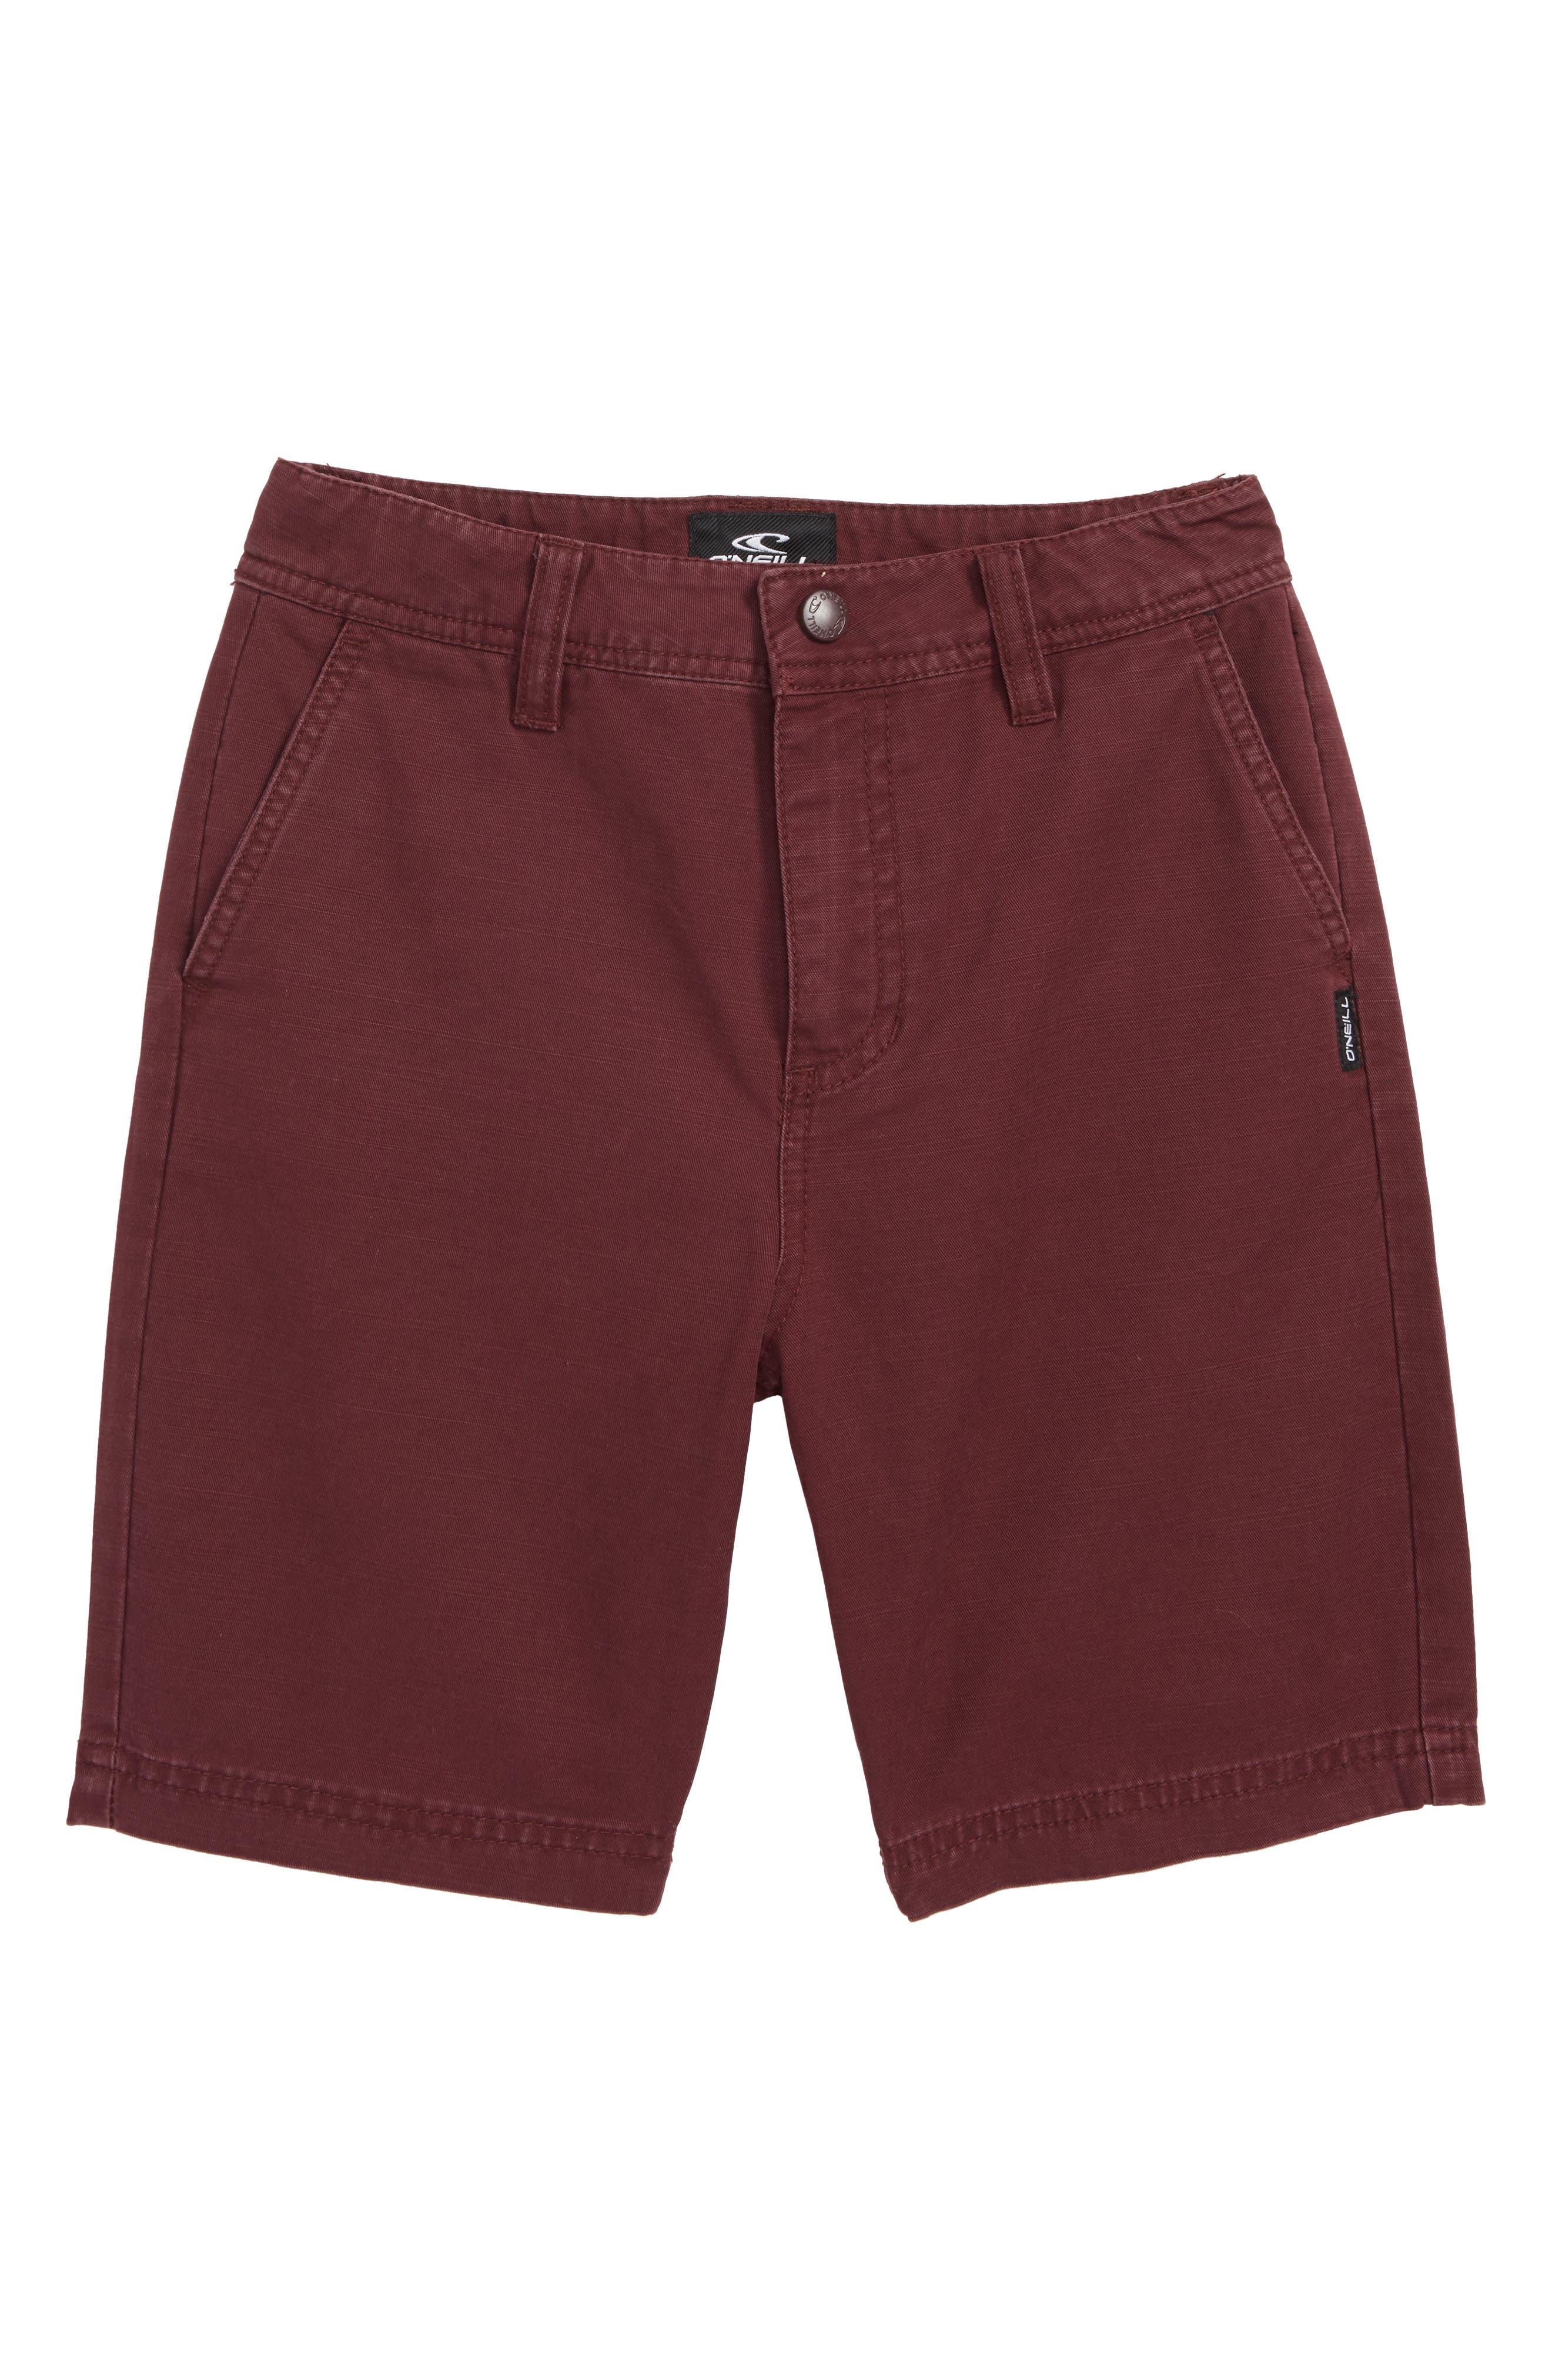 Jay Chino Shorts,                         Main,                         color, Wine